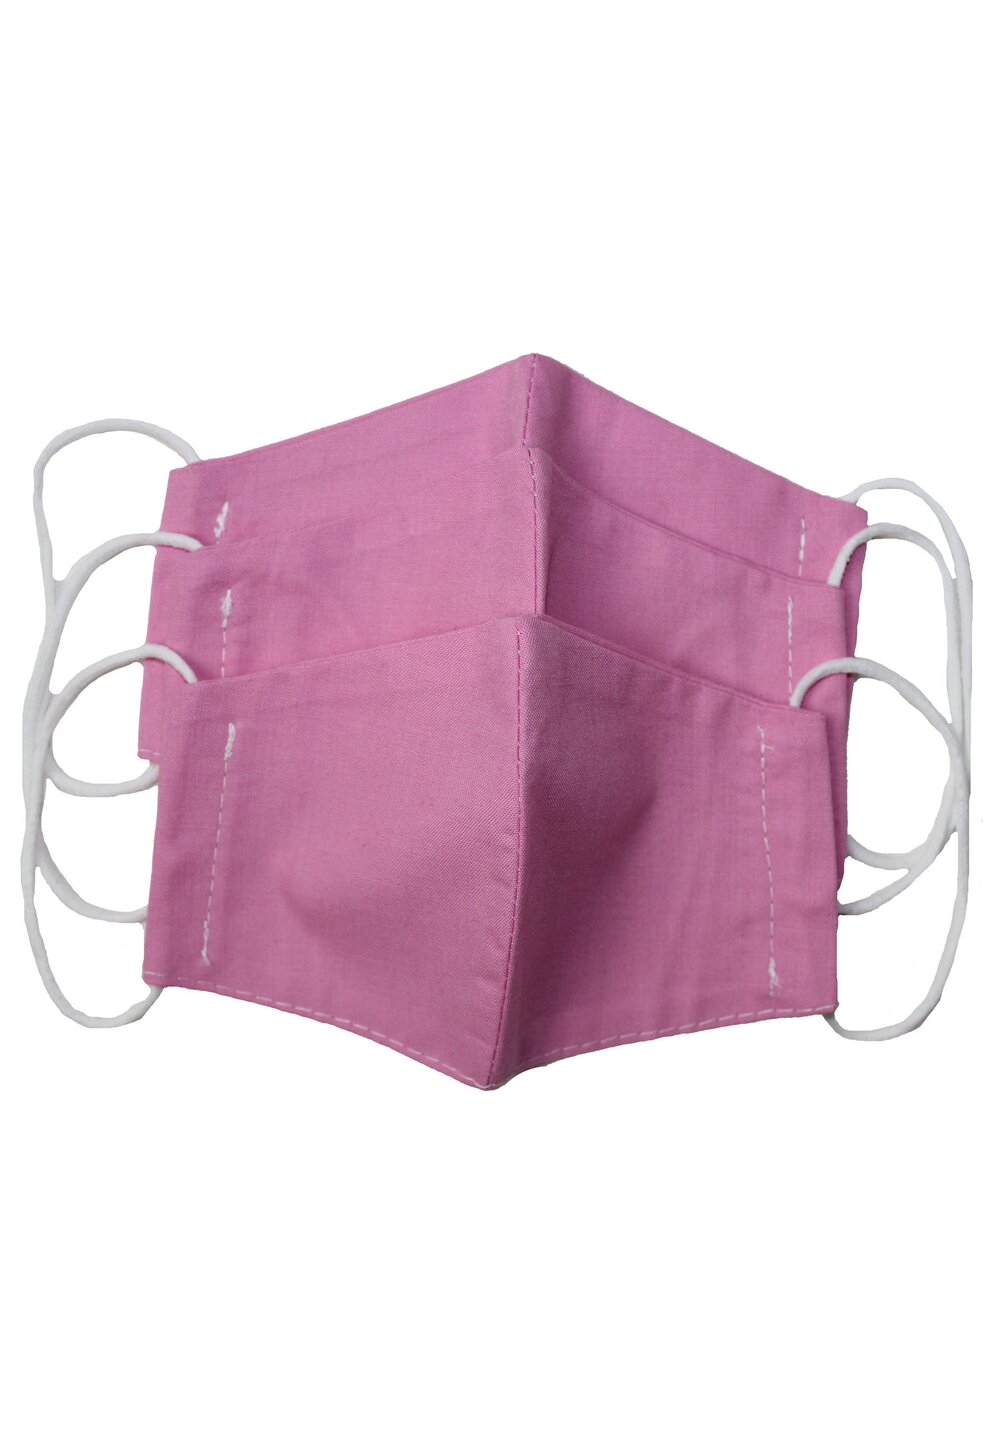 Masca reutilizabila, set 3 buc,fete, 2-6 ani, roz imagine